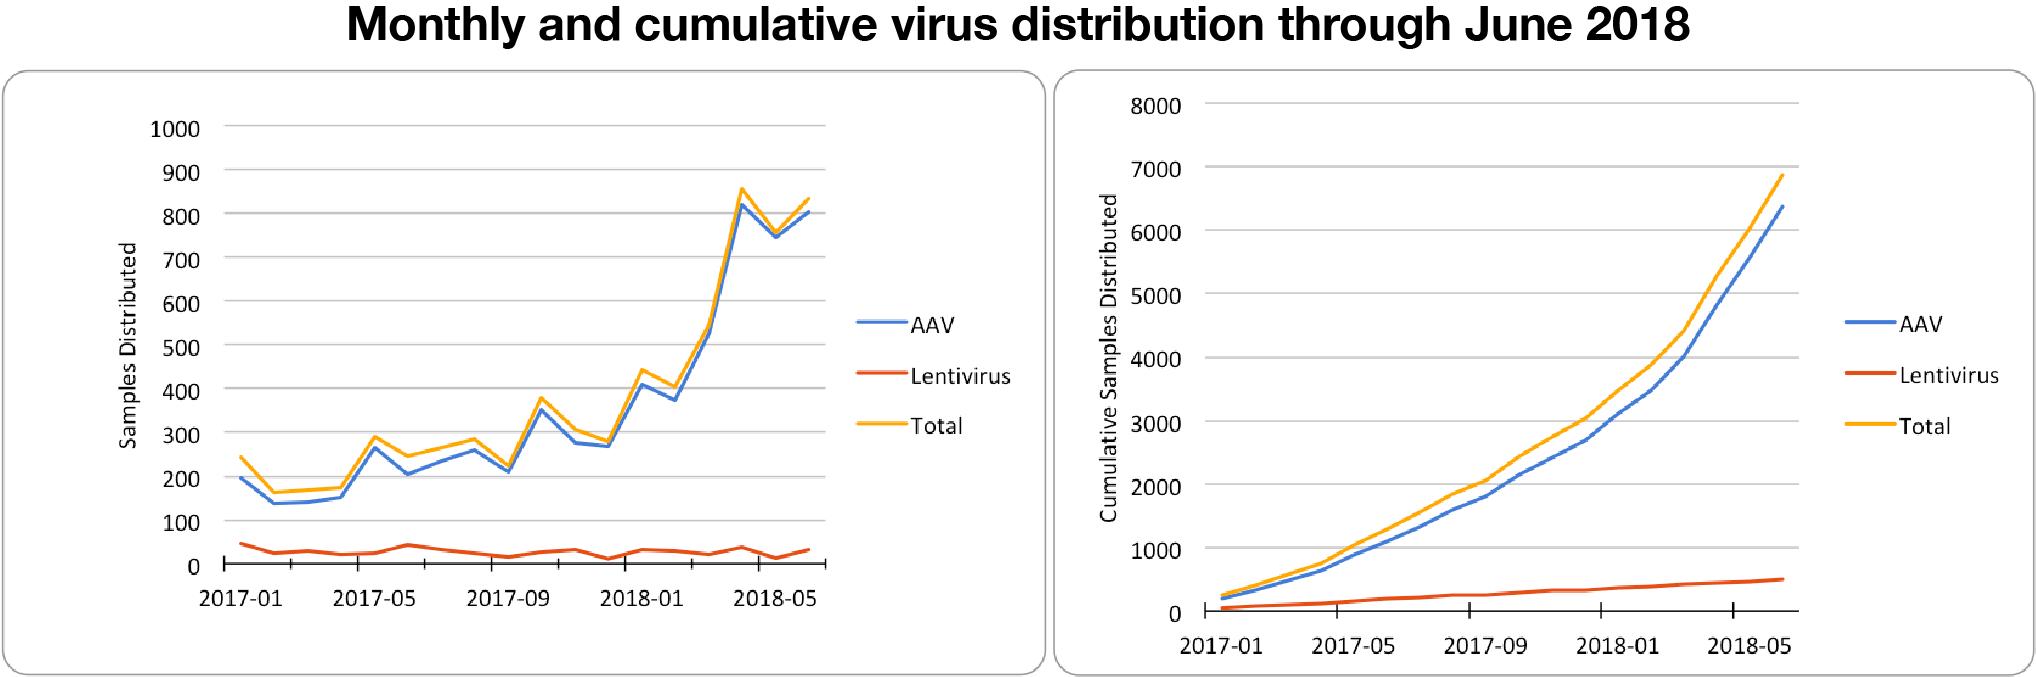 Monthly and cummulative AAV and lentivirus distribution through June 2018